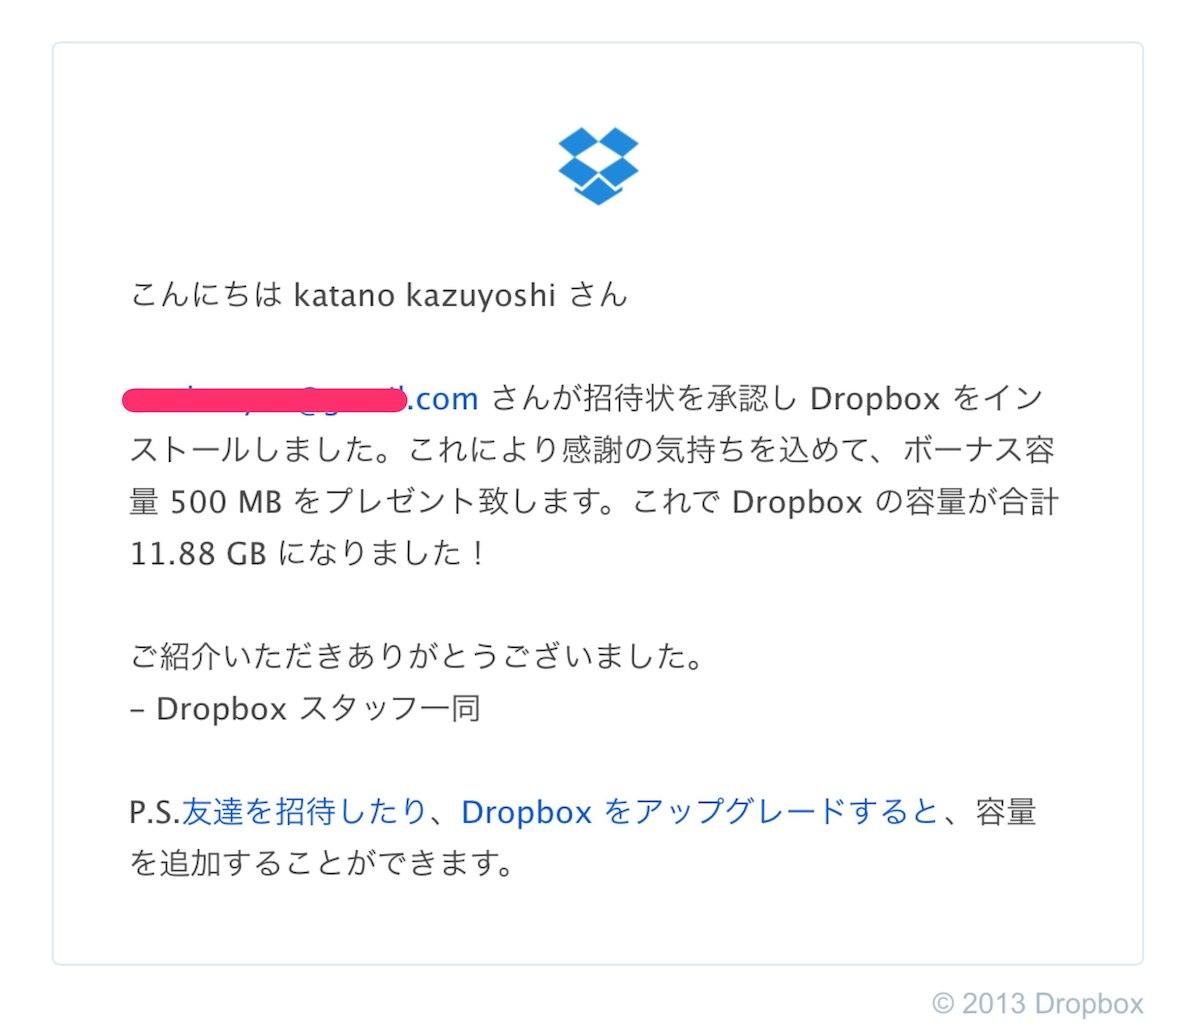 Dropbox をご紹介頂き、ありがとうございます! - kazuyoshi.katano@gmail.com - Gmail.jpg